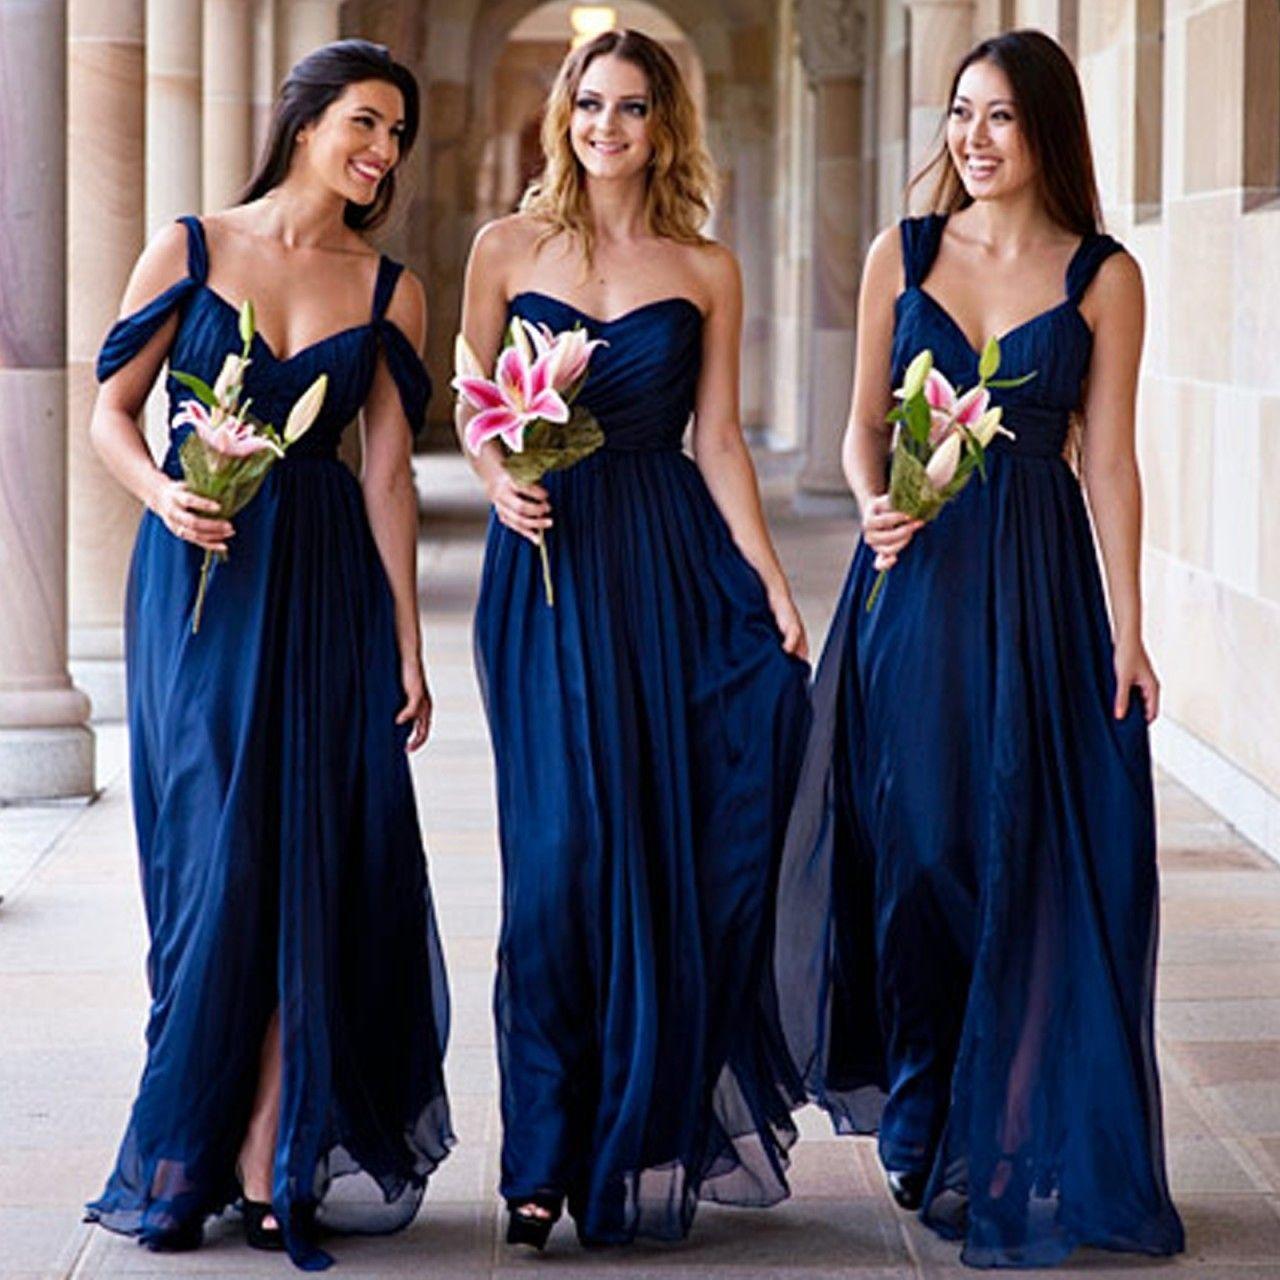 Tania Olsen Dress | Bridesmaid Dresses